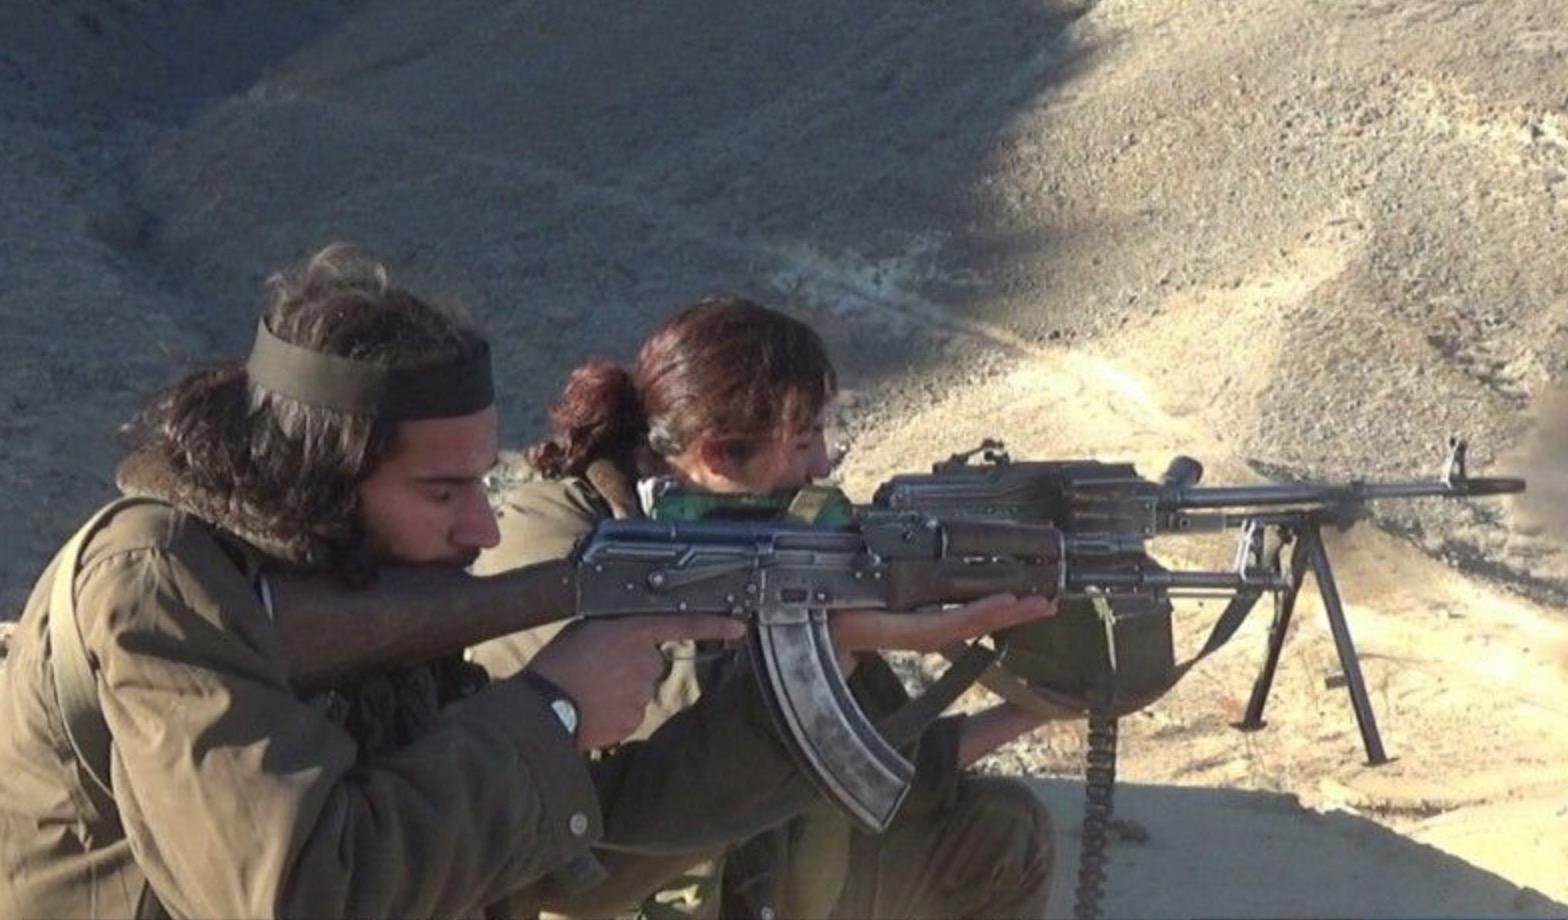 IŞİD: Afganistan'da 18 köyü ele geçirdik